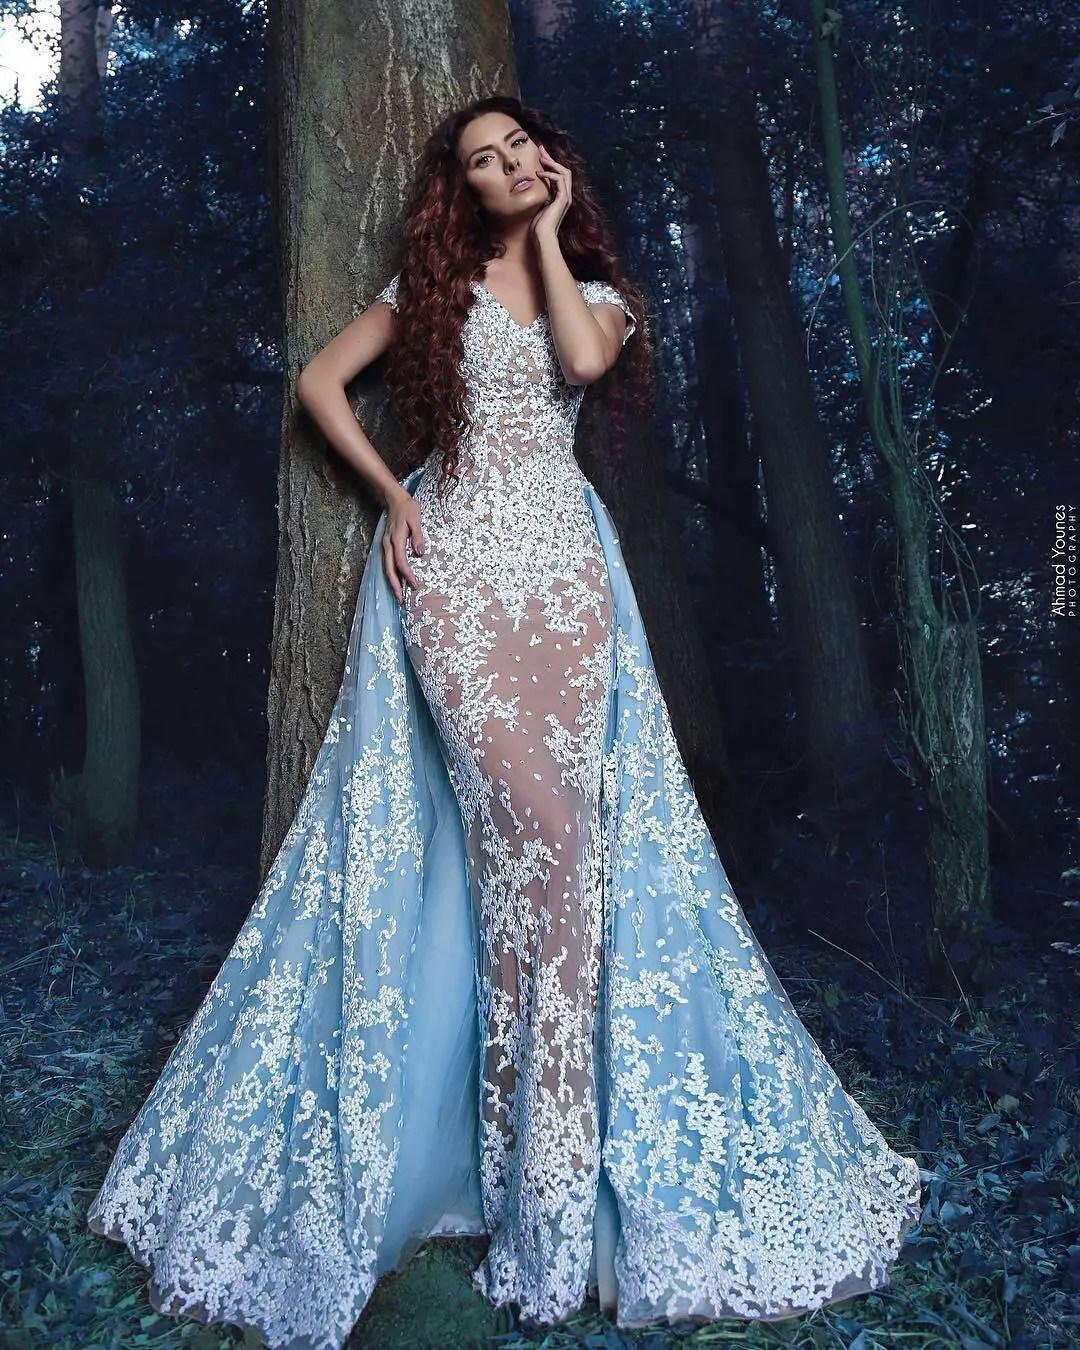 Sexy Wedding Reception Dresses | A Million Styles Africa